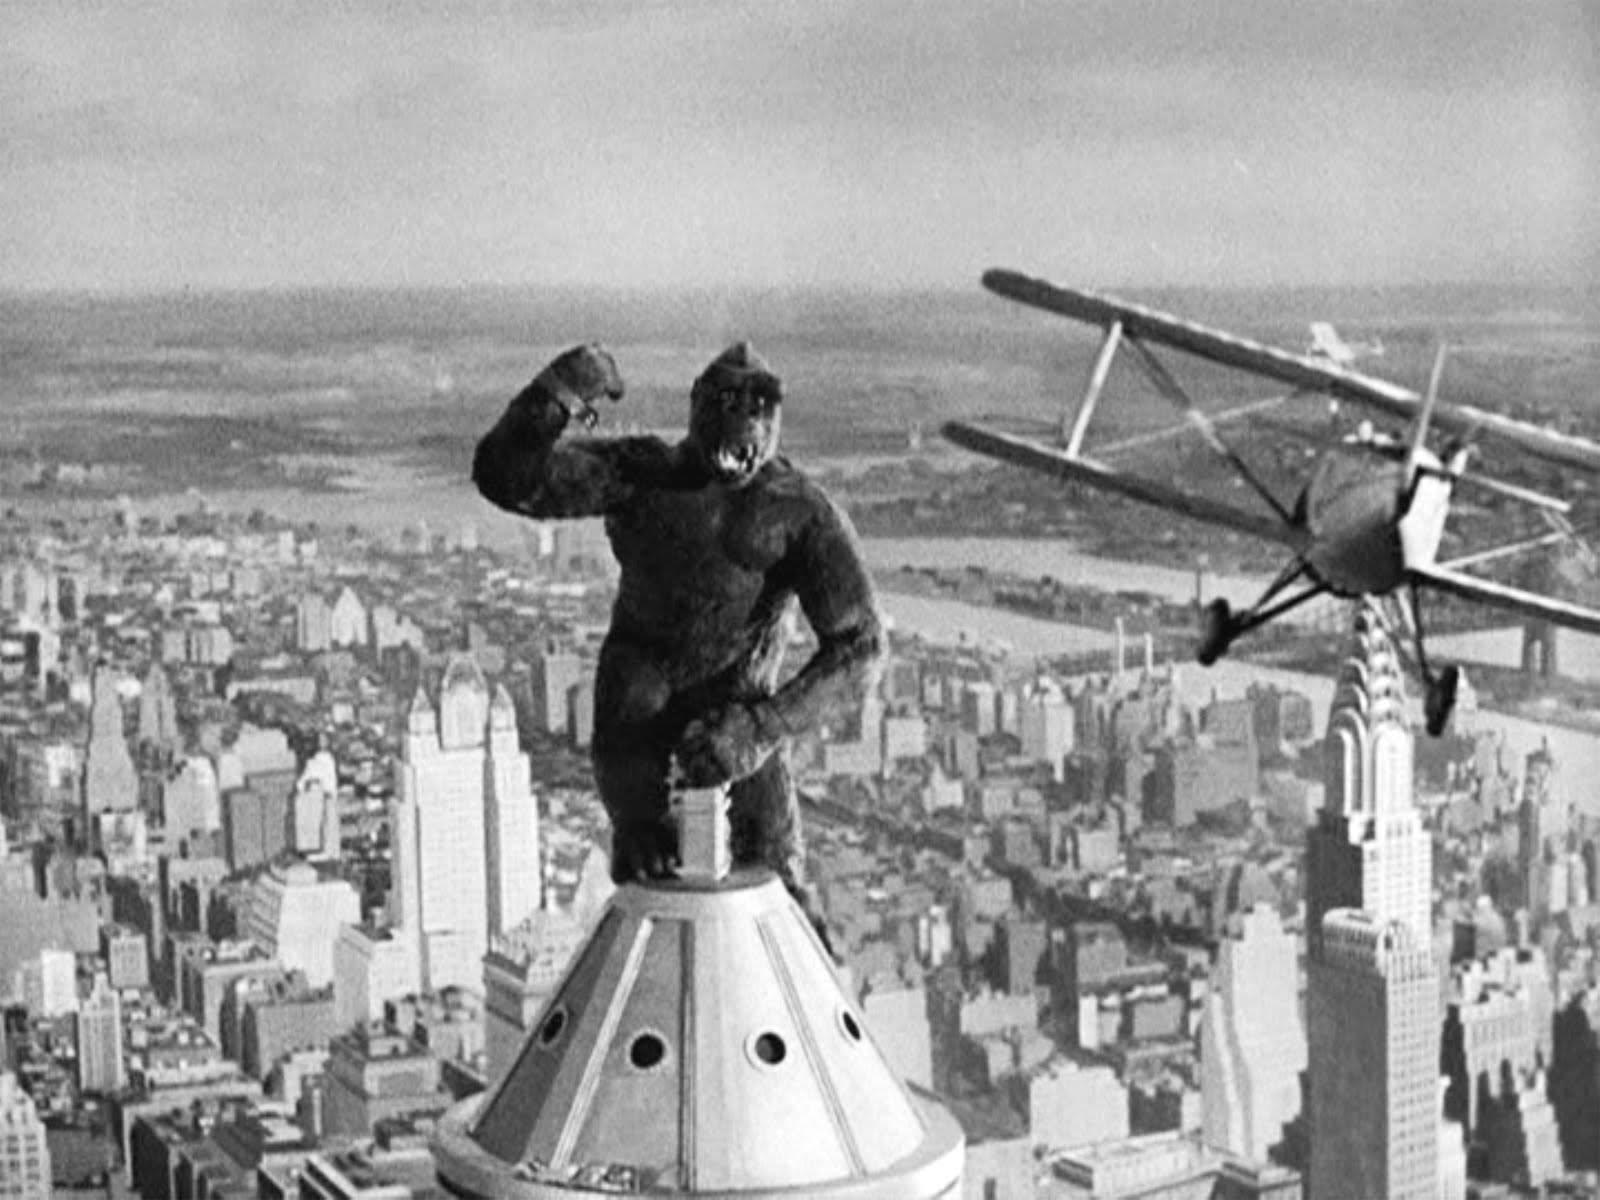 King Kong To Descend On Detroit